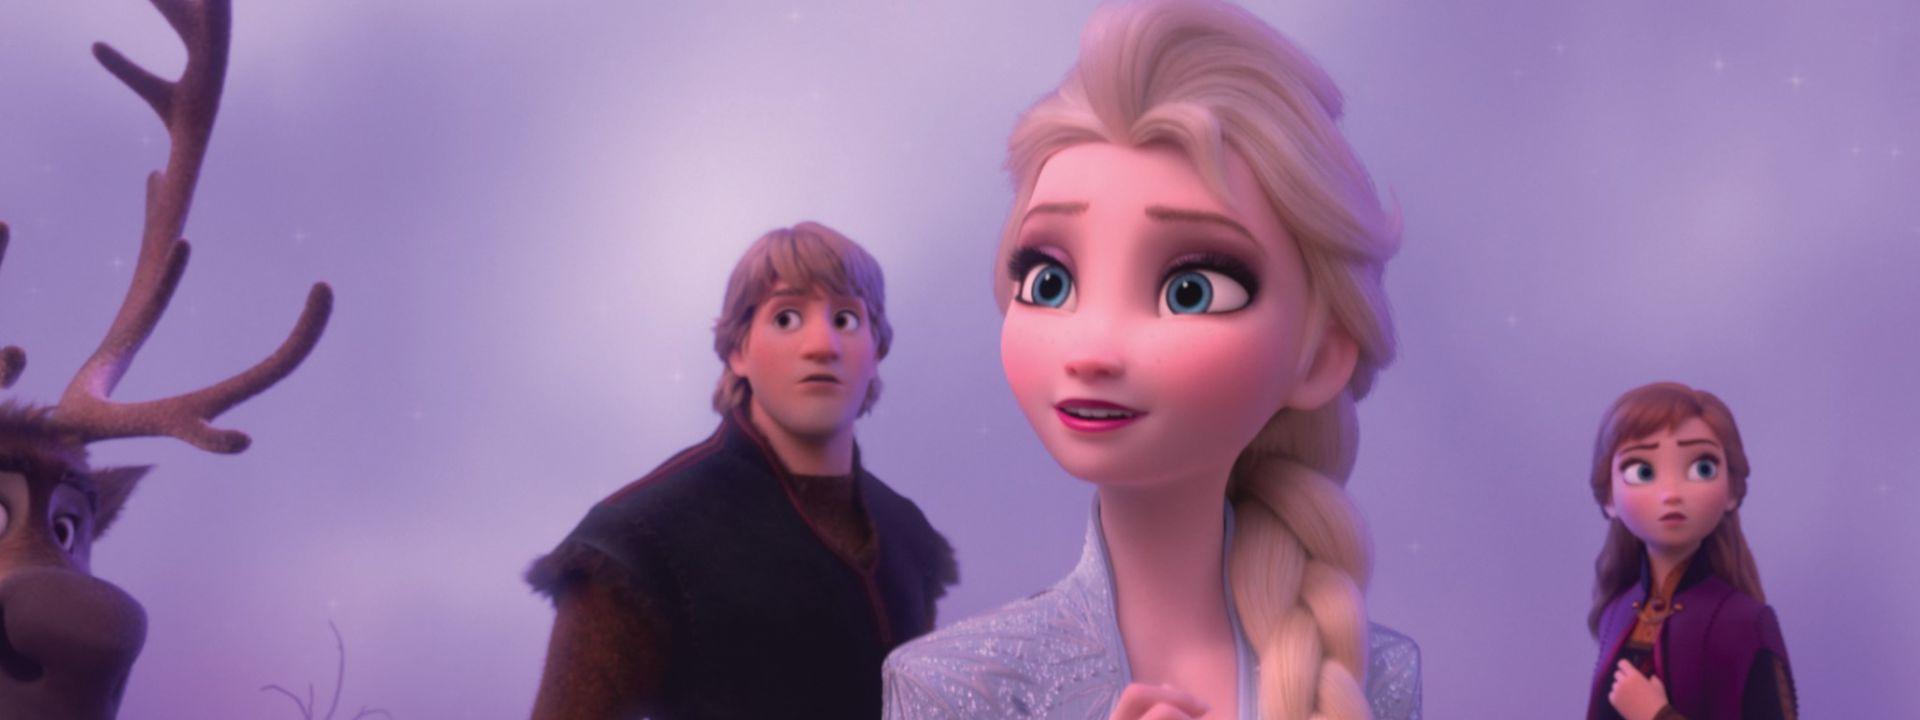 Park Your Cinema Kids: Frozen 2 (2019) - Εικόνα